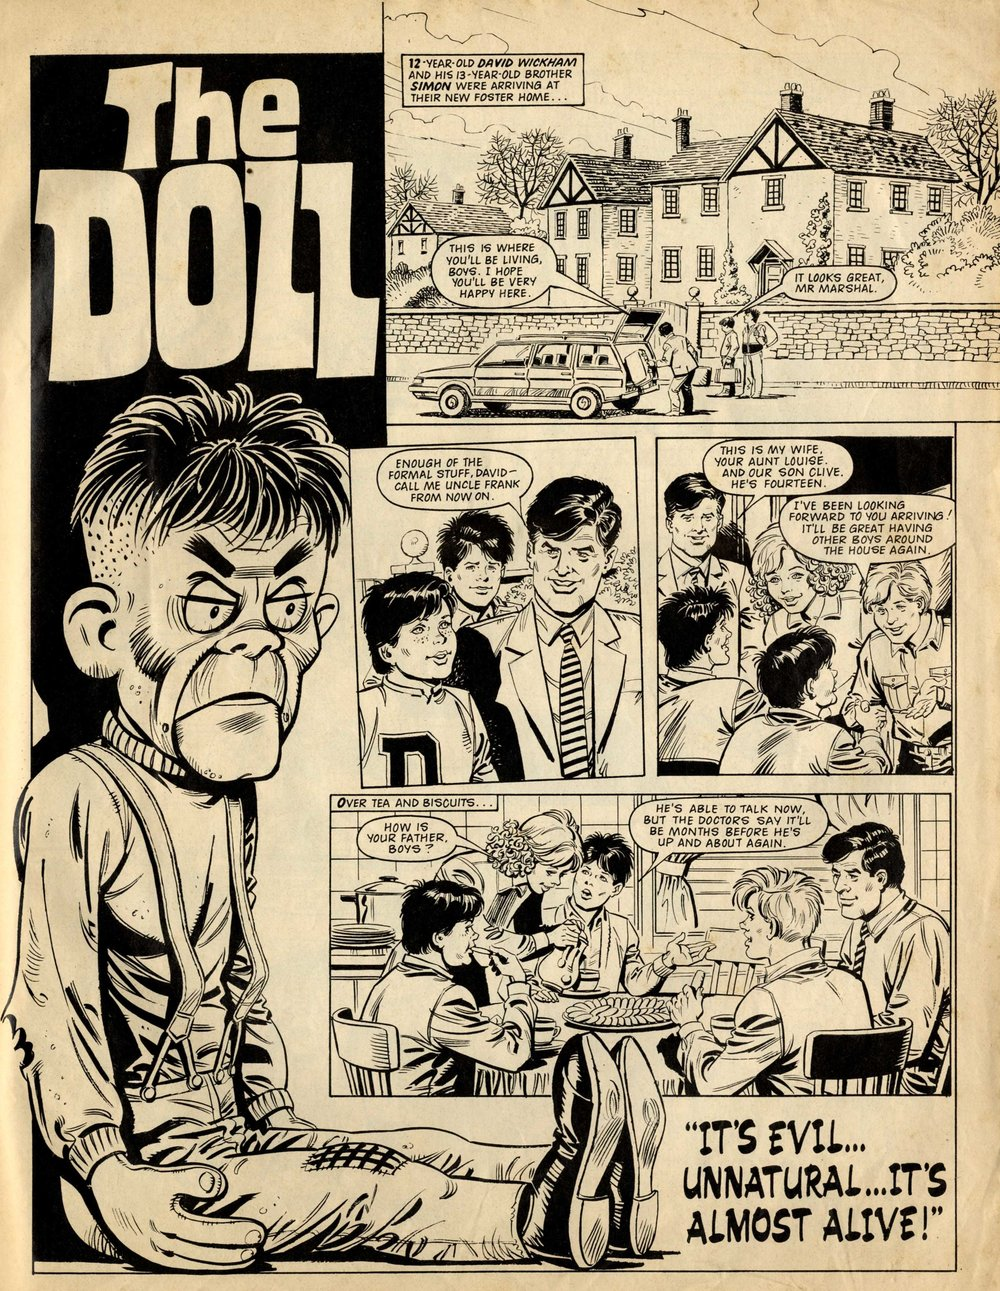 The Doll: Francesc Masip (artist)